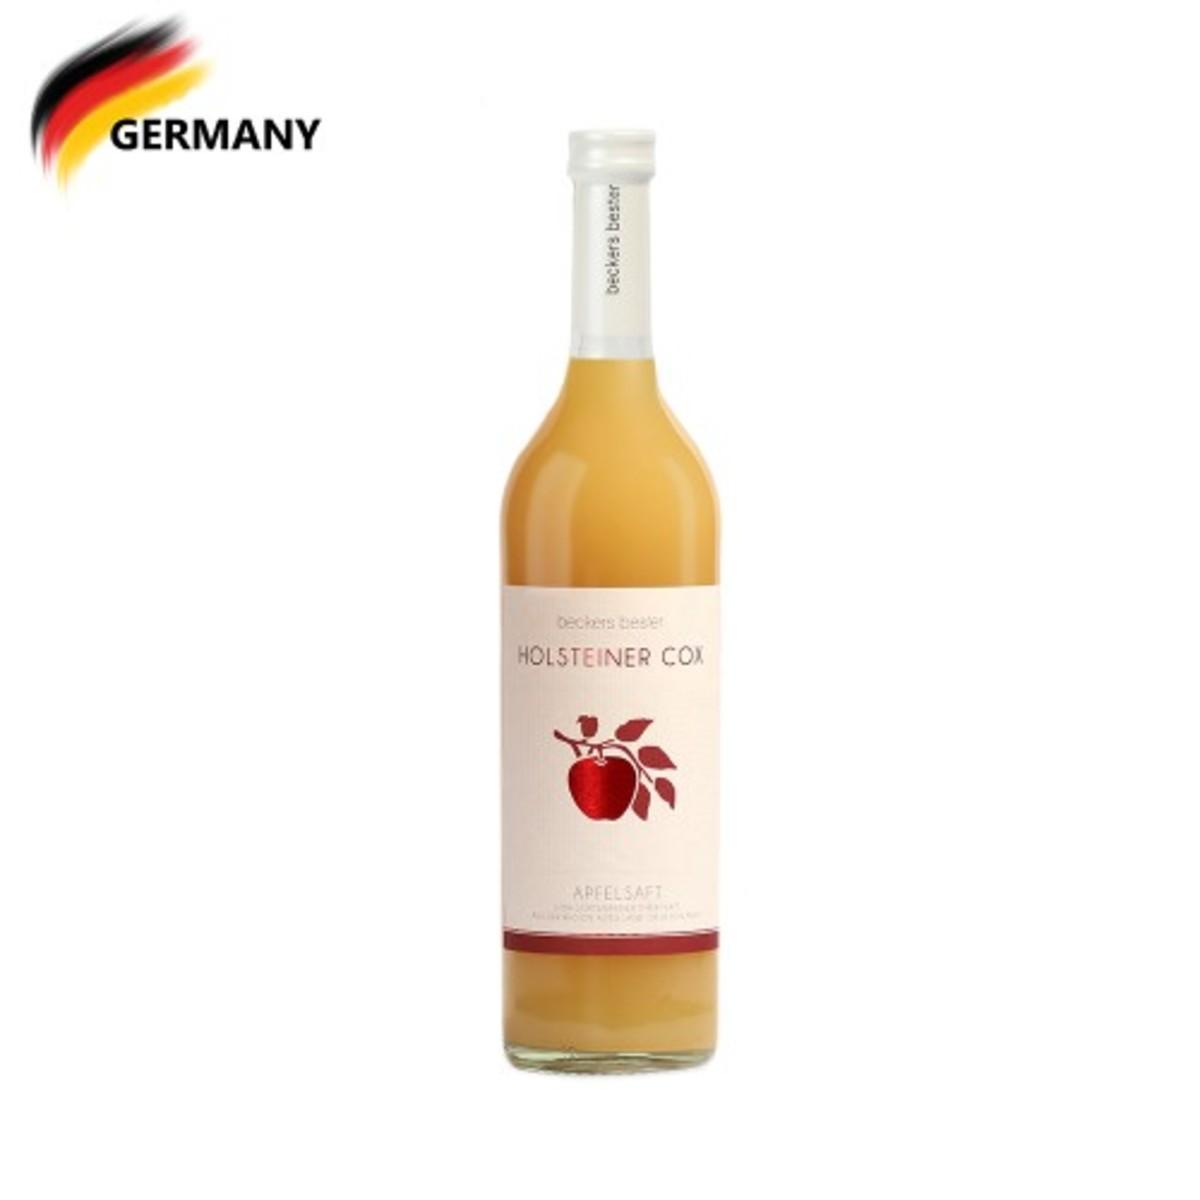 Single Origin Cloudy Apple Juice - Holsteiner Cox (Germany - Altes Land) 700ml